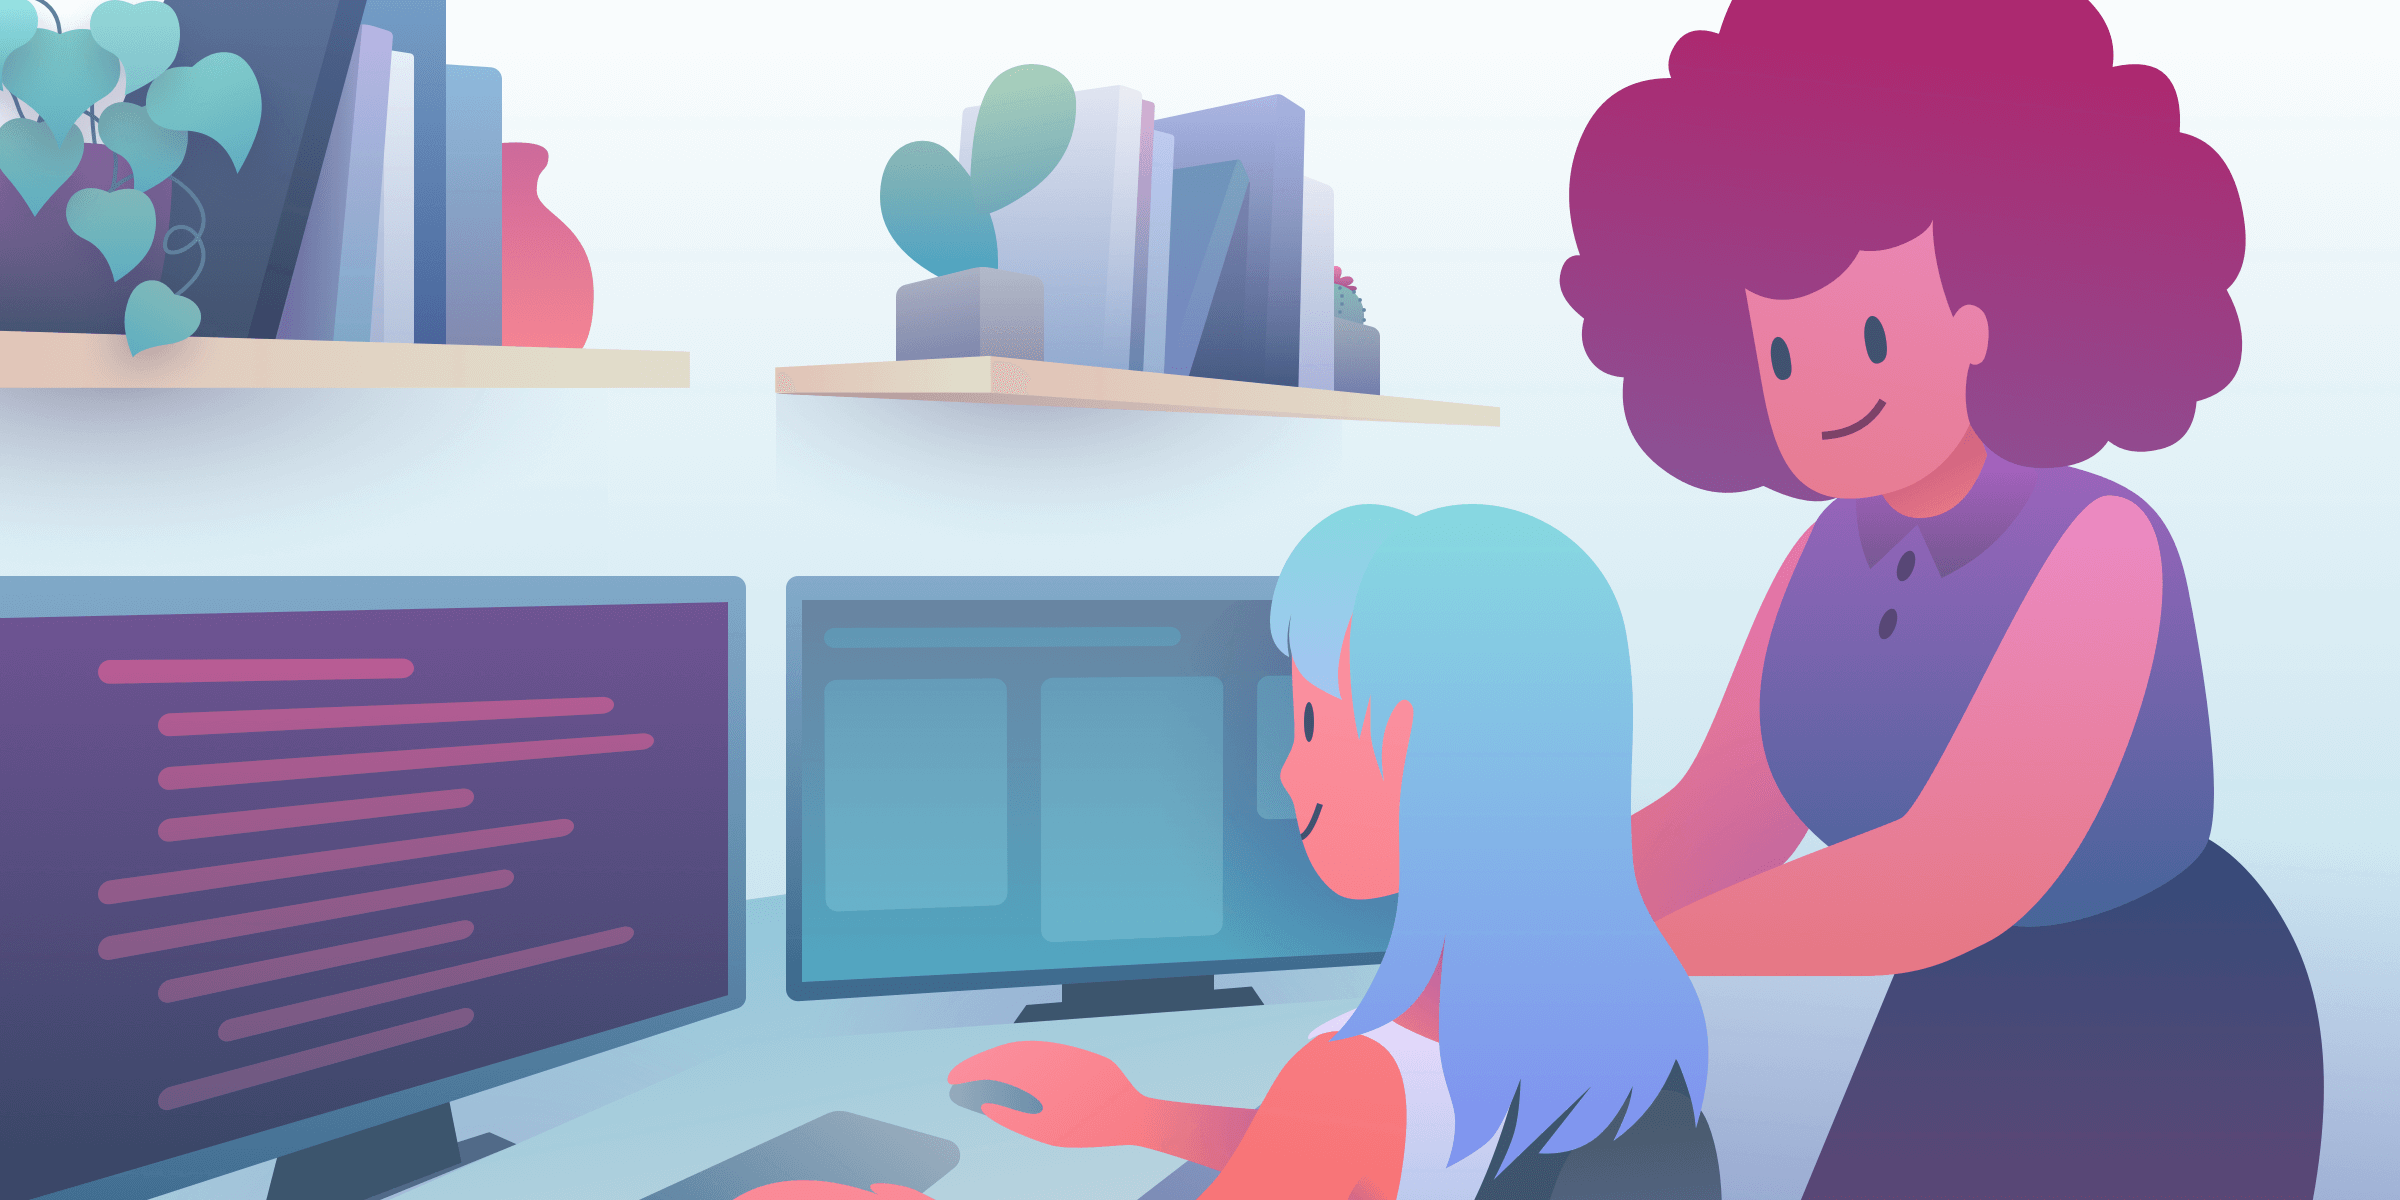 Illustration of women coding at 2 computer monitors